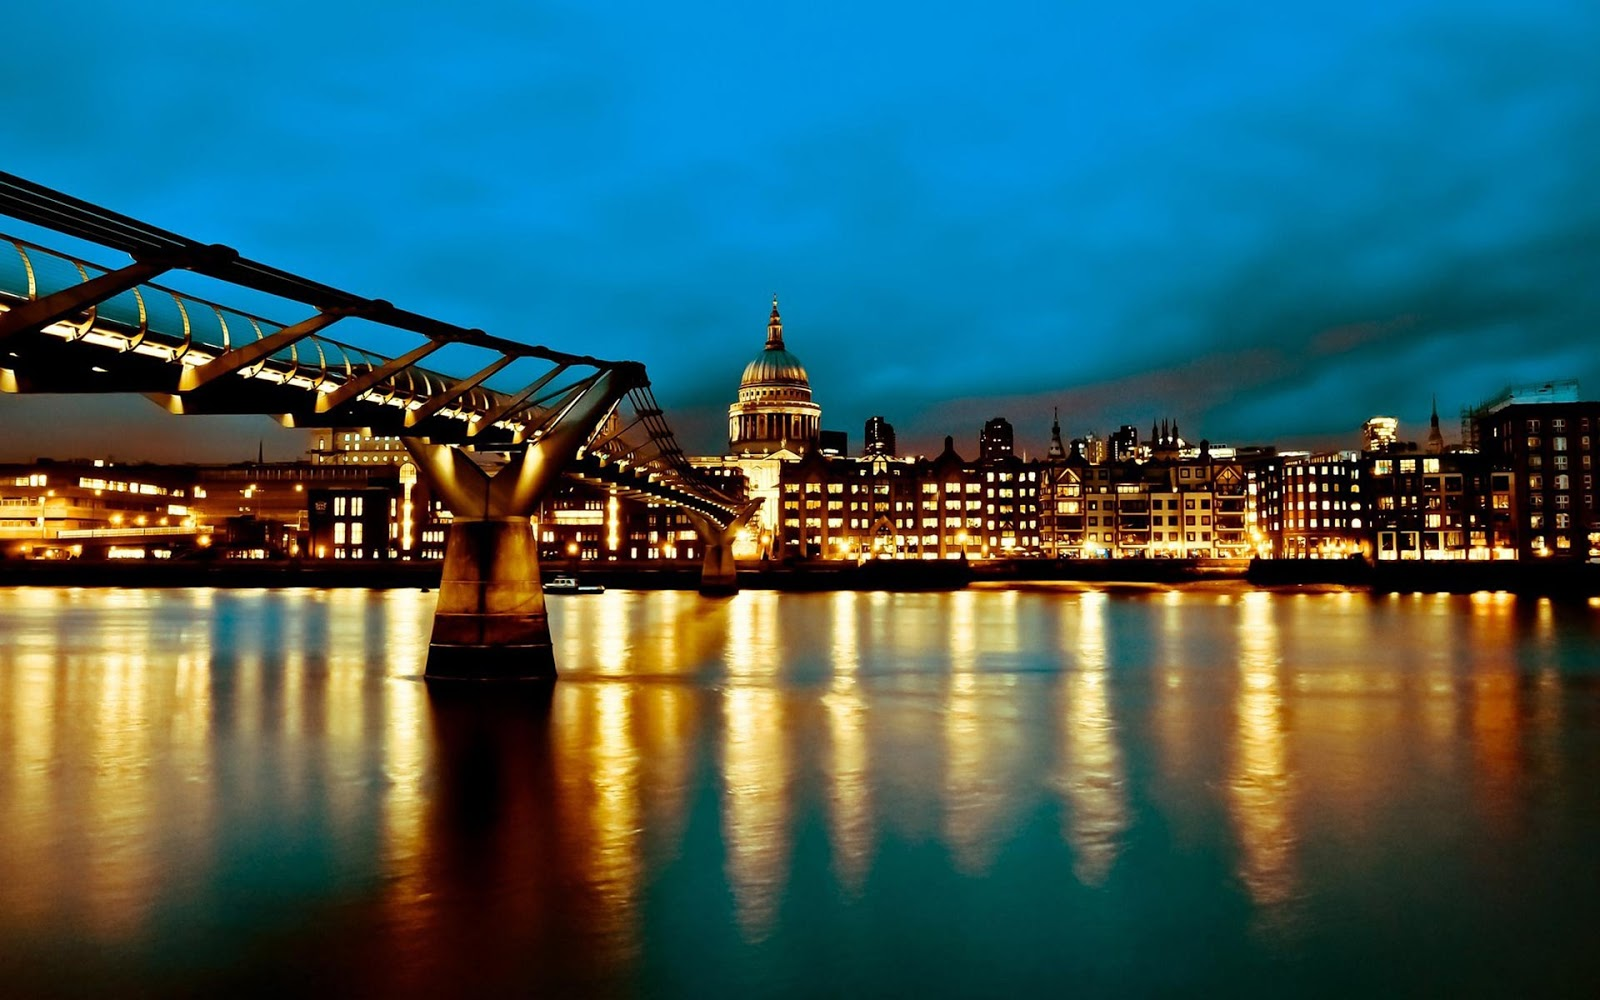 Best Beautiful Wallpaper Tower Bridge Of London Hq Full -6864